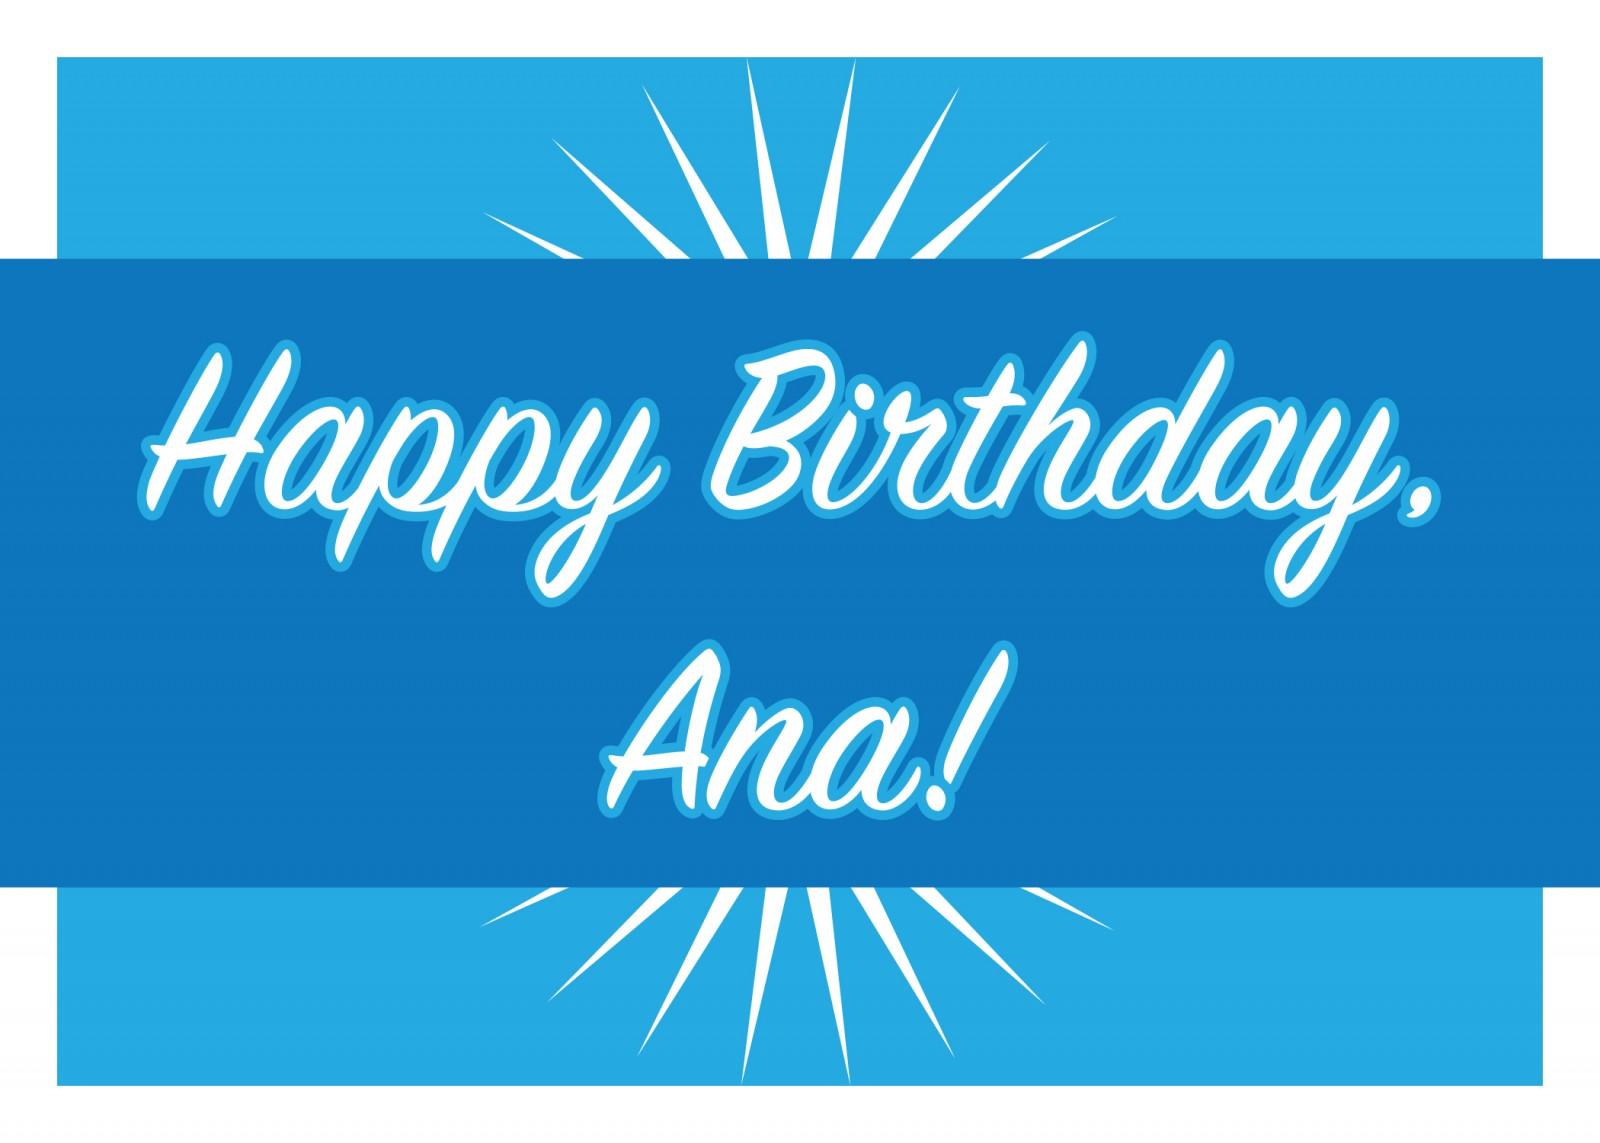 Happy Birthday Ana Officenters Innovative Office